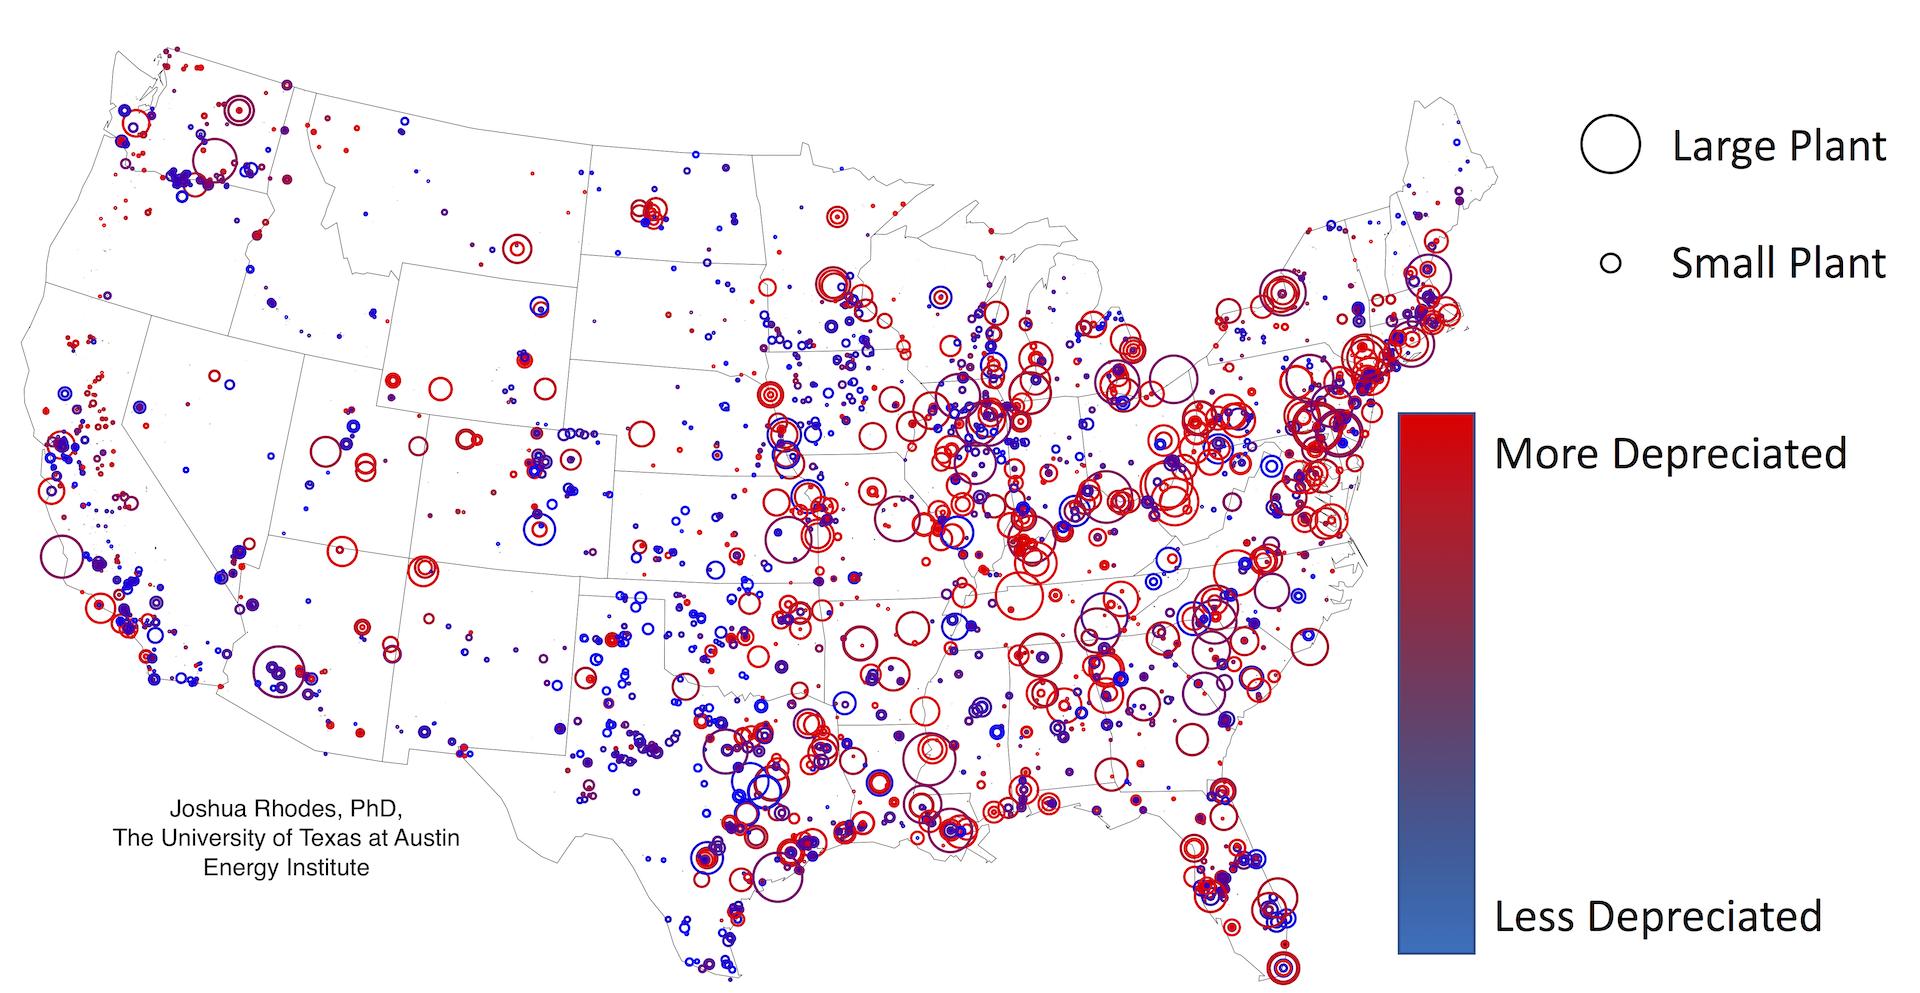 Elegant Location And Depreciated Status Of All U.S. Power Plants. Joshua Rhodes,  EIA Form 860 Data.